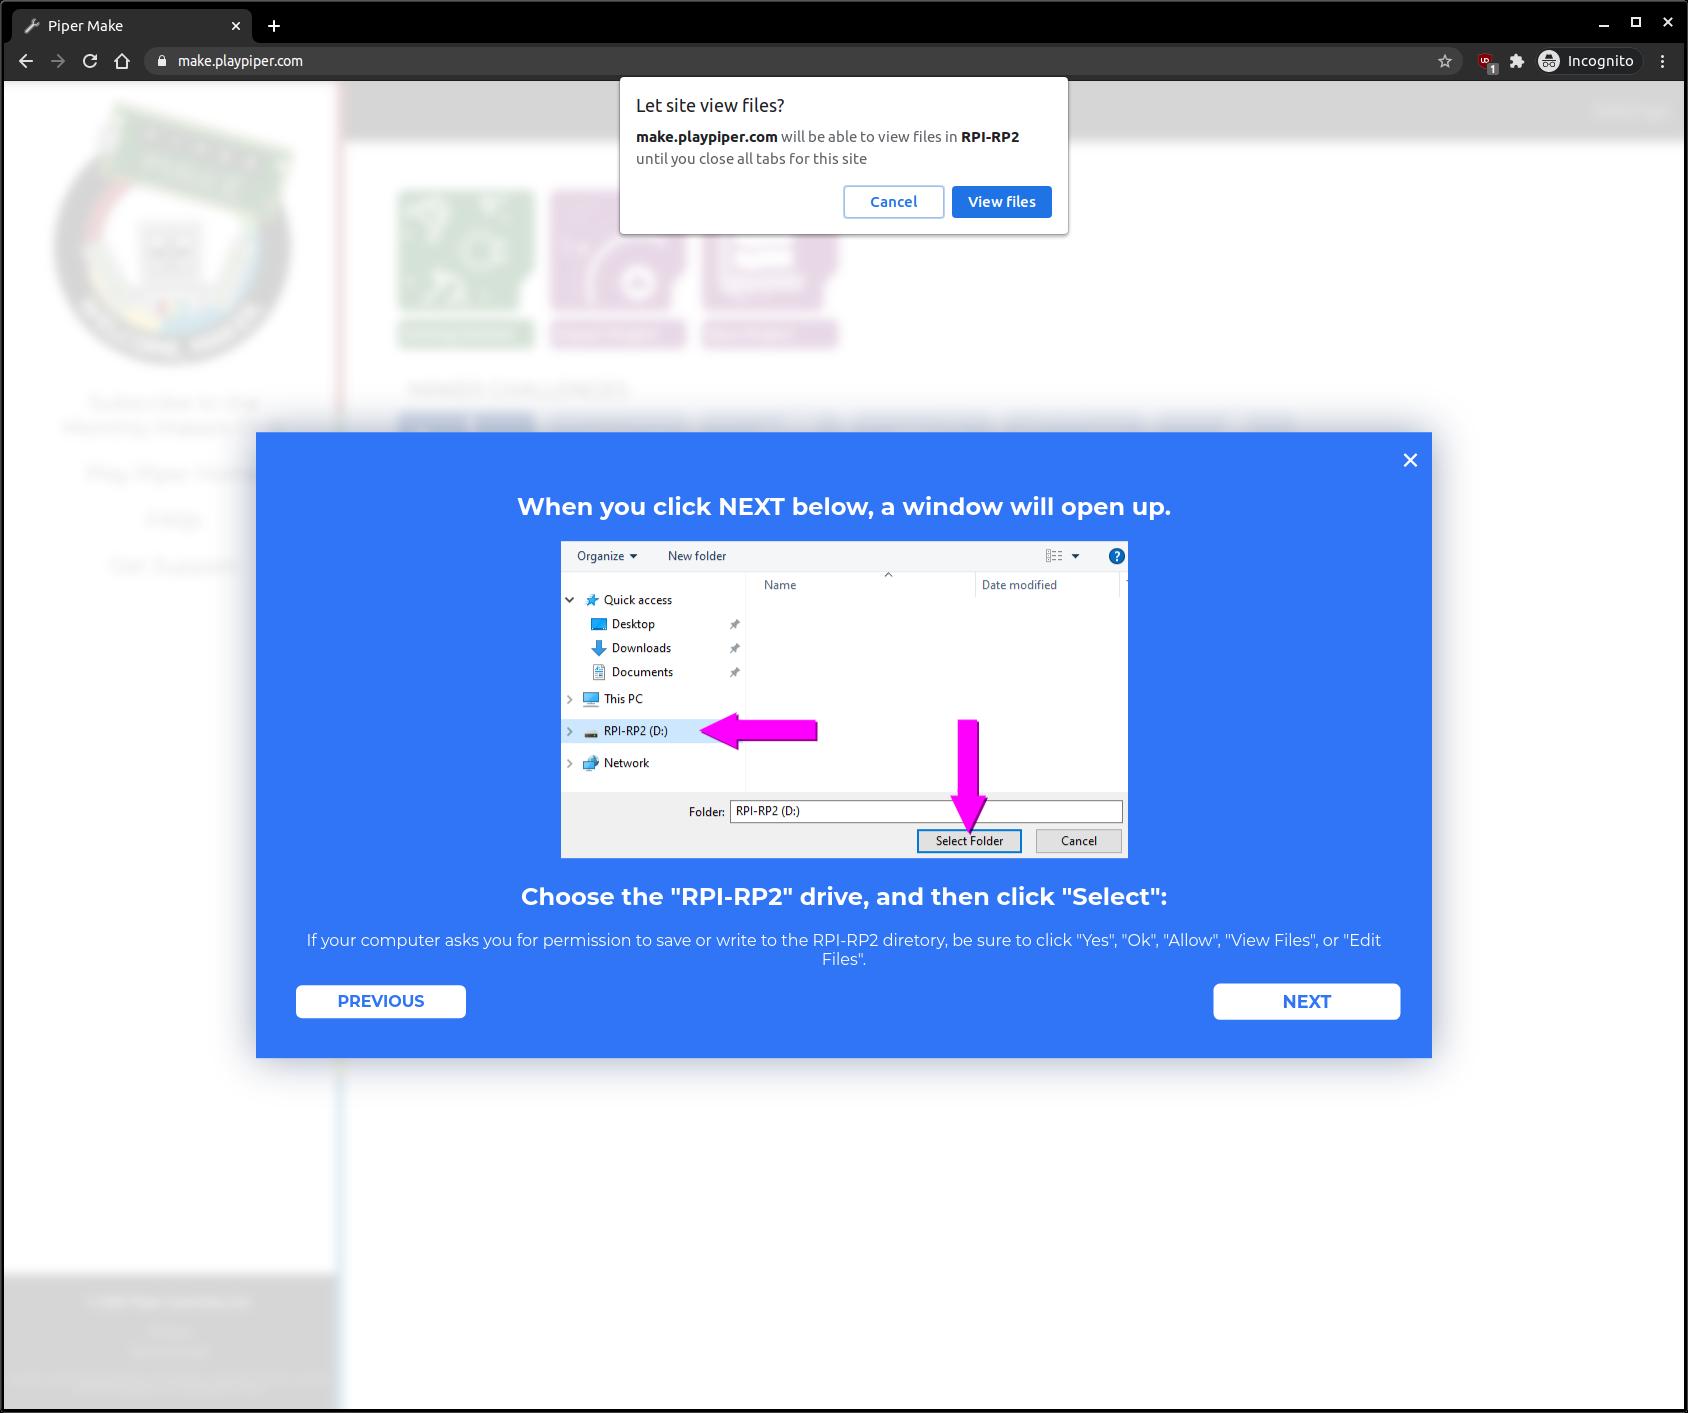 raspberry_pi_Screenshot_from_2021-04-16_17-19-19.png